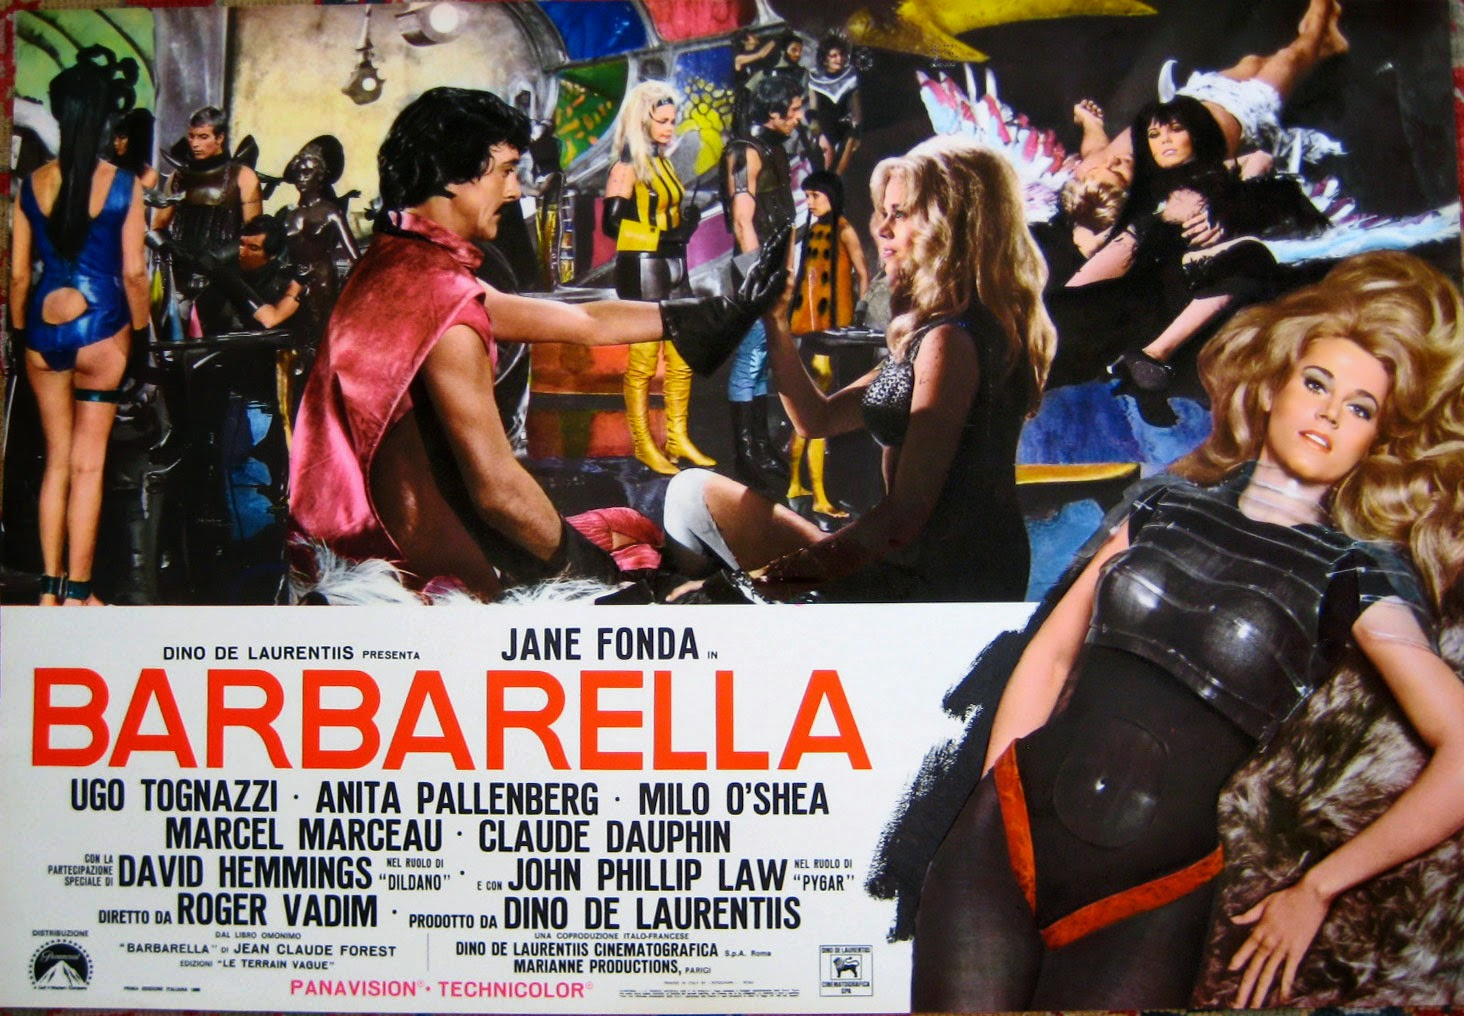 www.cannibal-filmes.blogspot.com